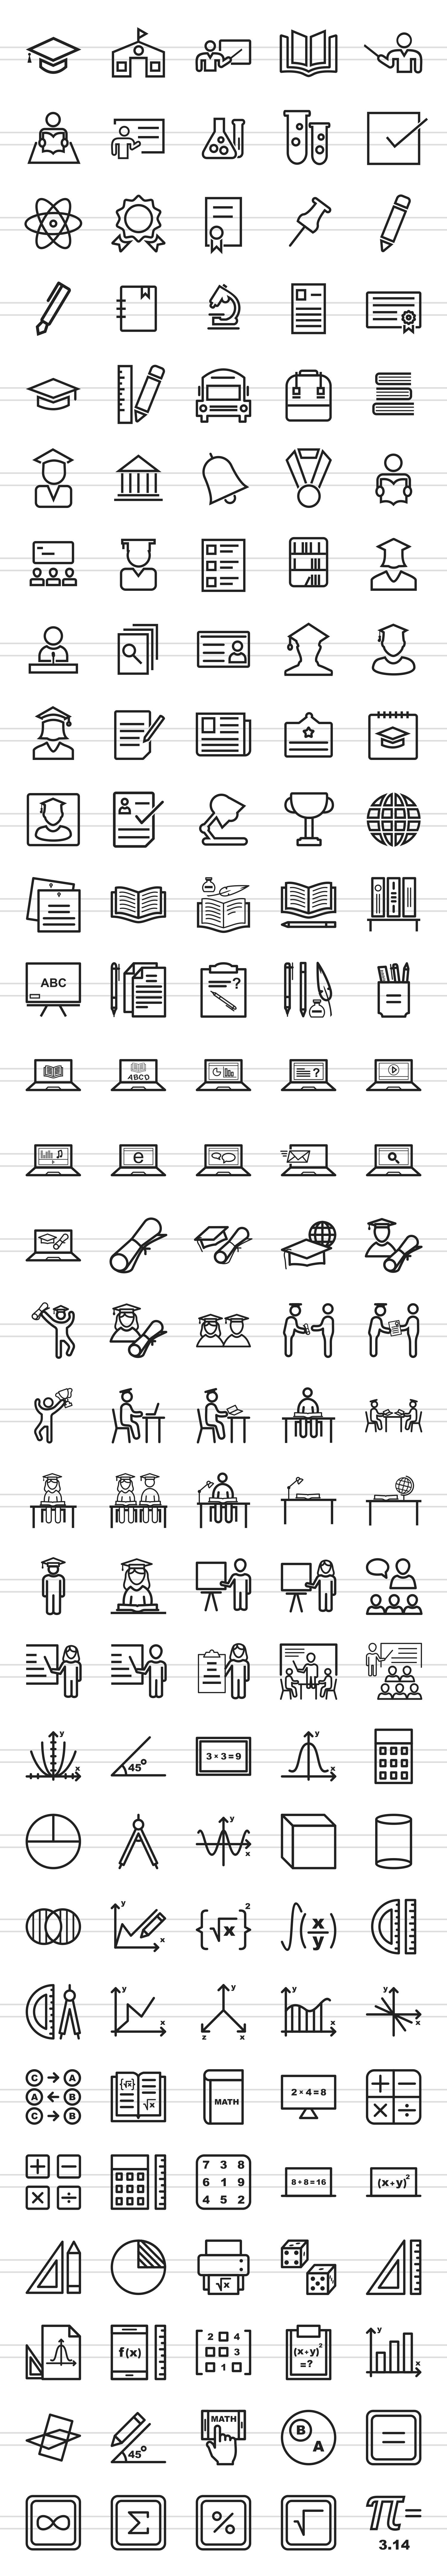 150 Academics Line Icons example image 2